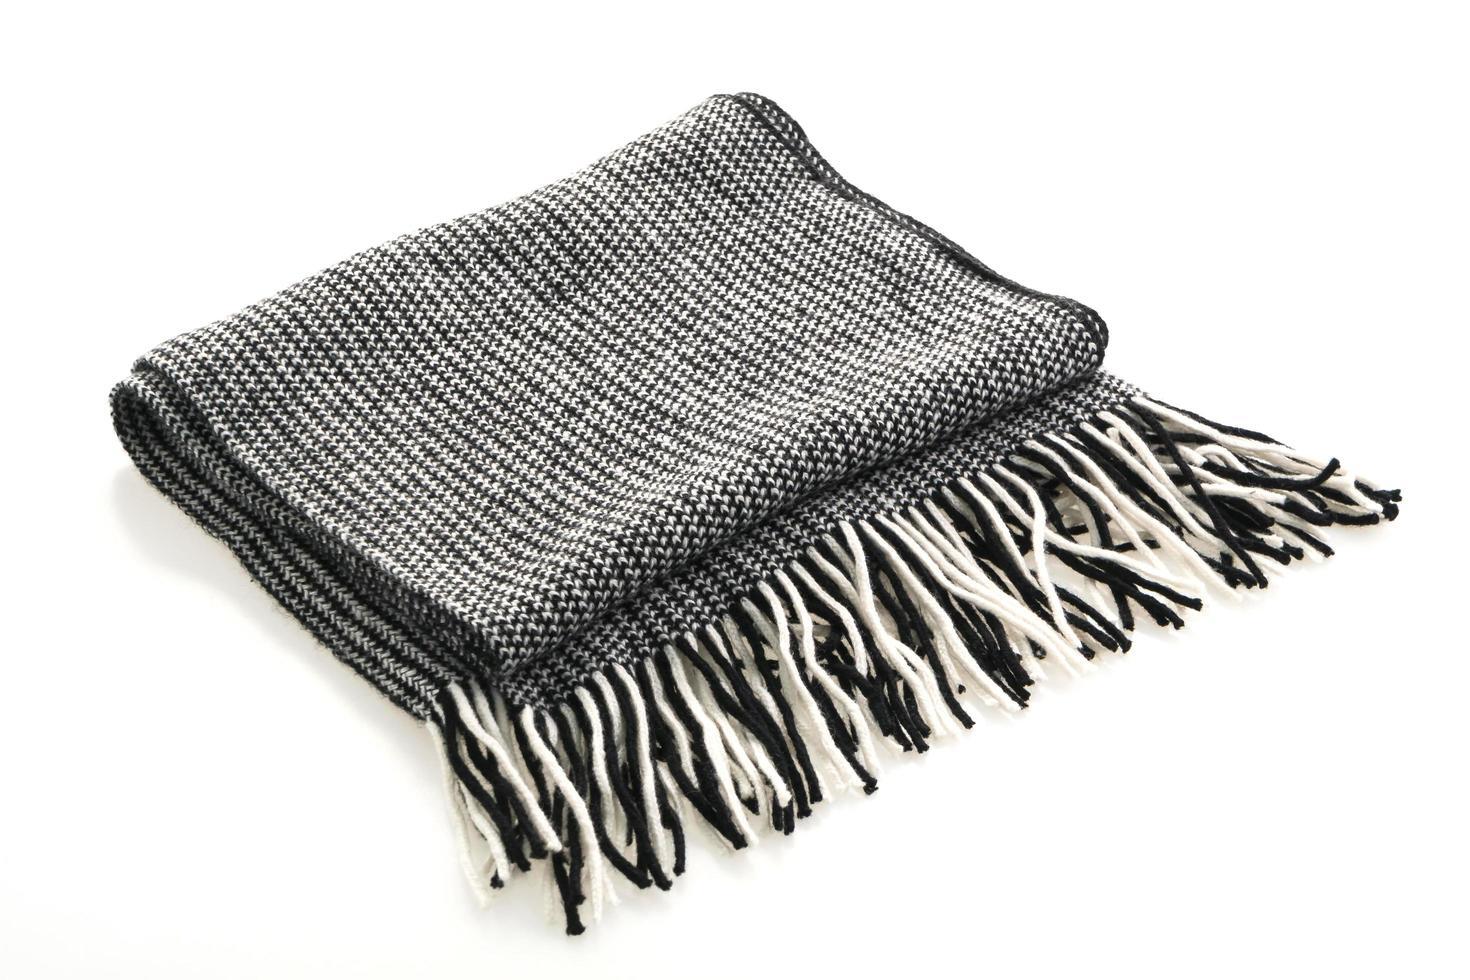 grå halsduk på vit bakgrund foto